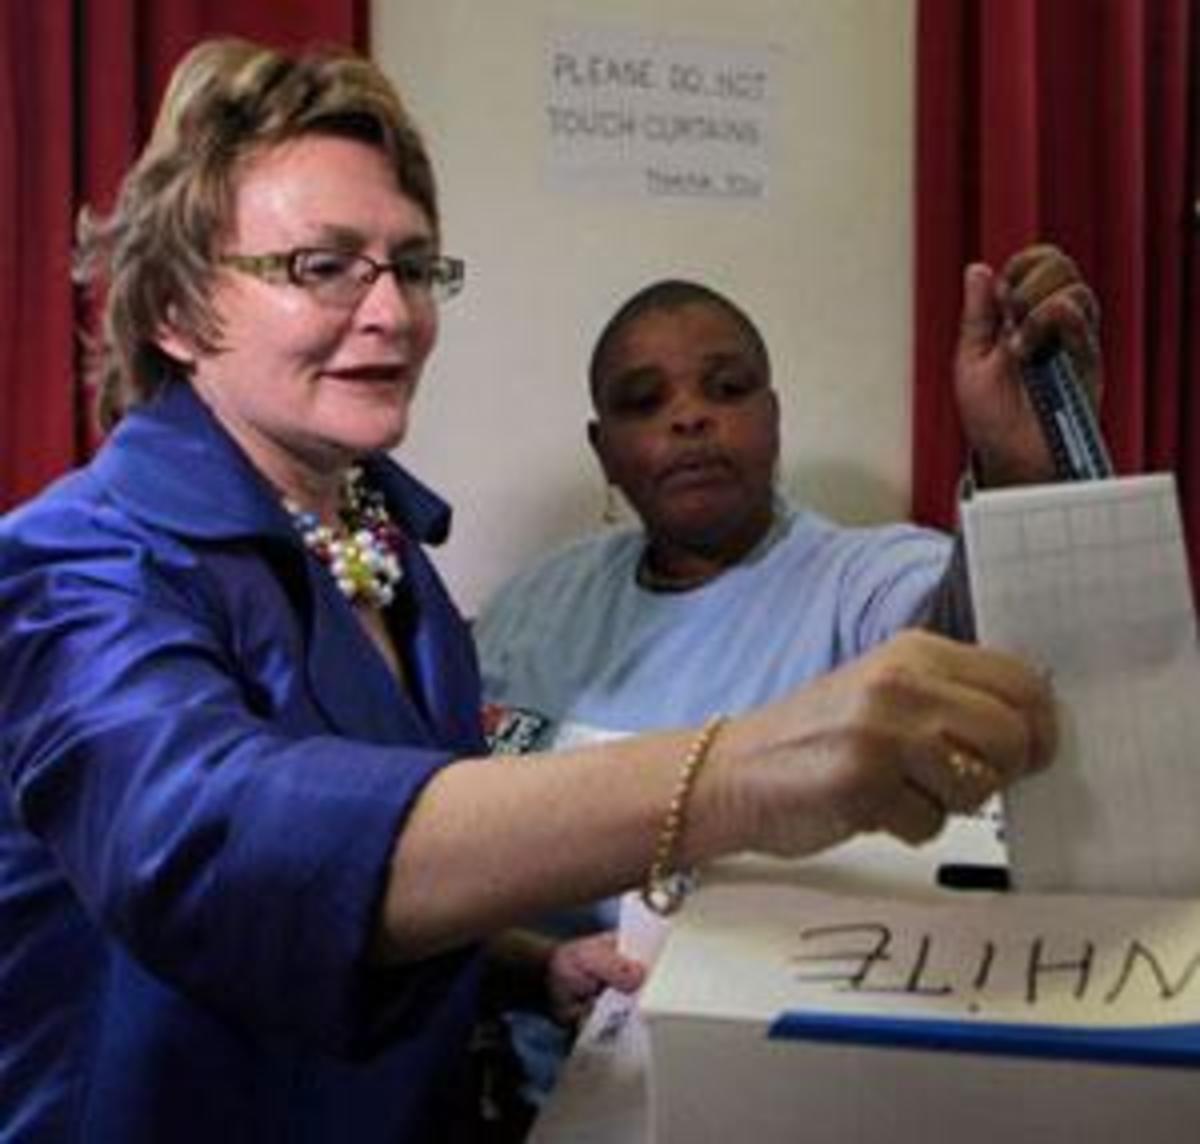 Helen Zille(Leader of the DA) votes on Wednesday